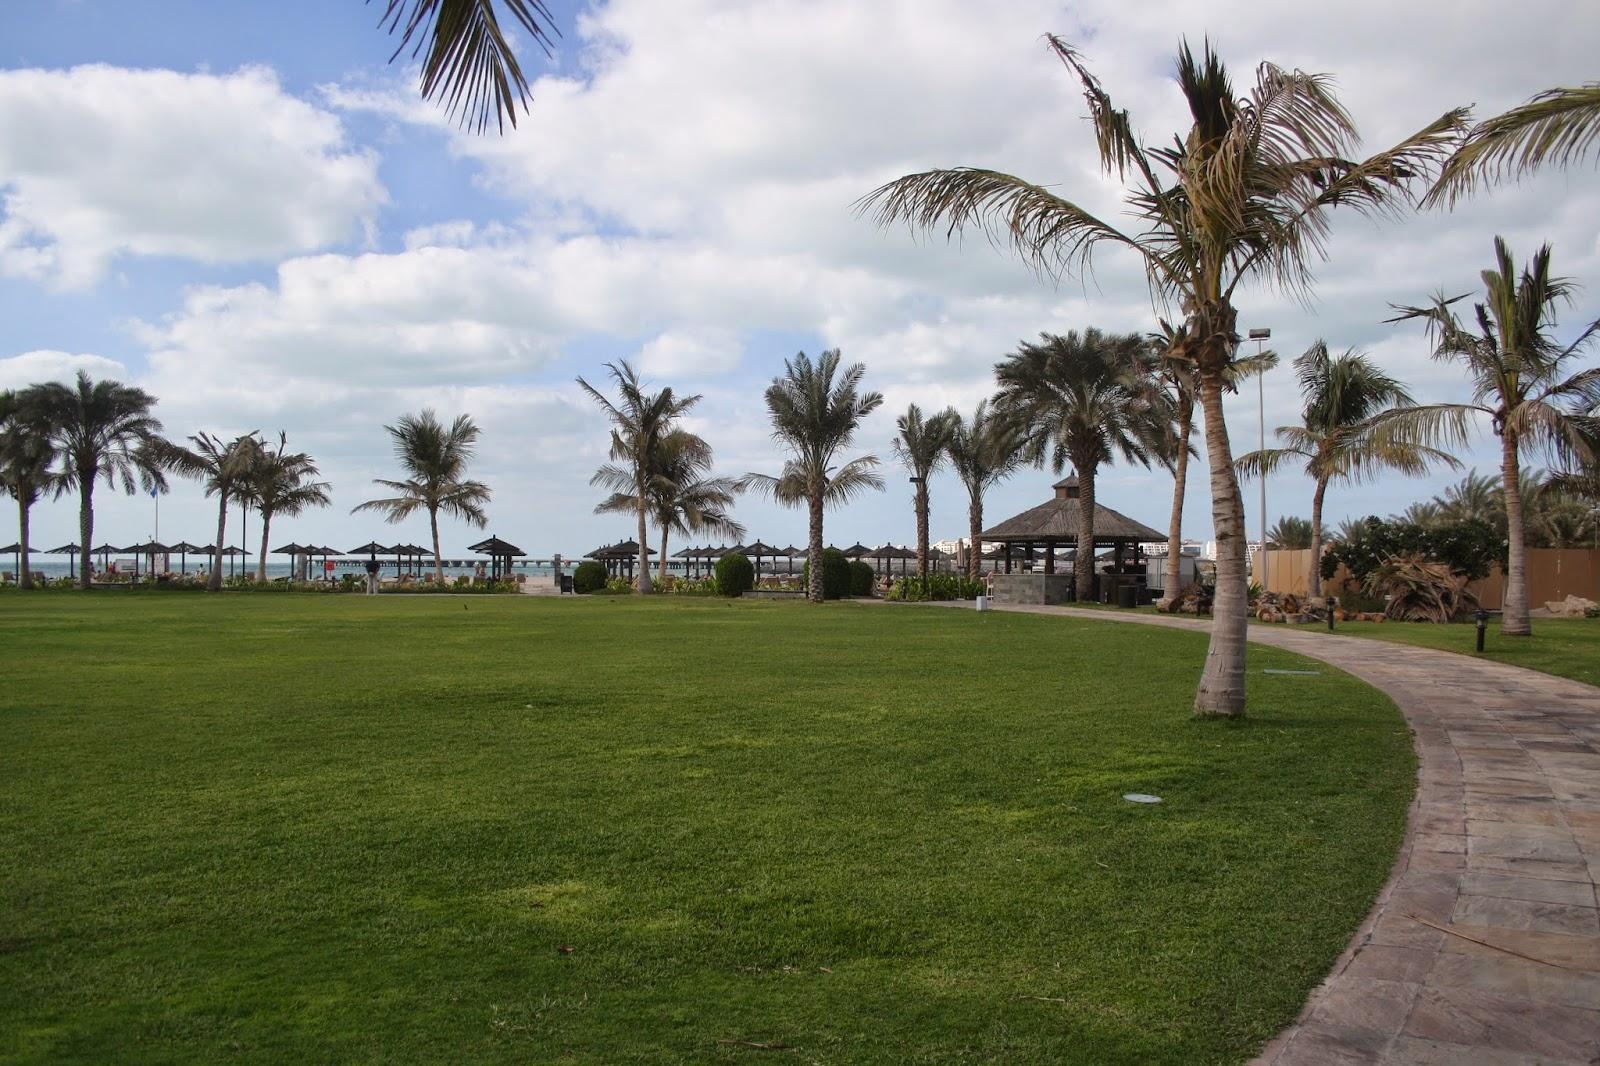 DUBAI PHOTO DIARY I. 15